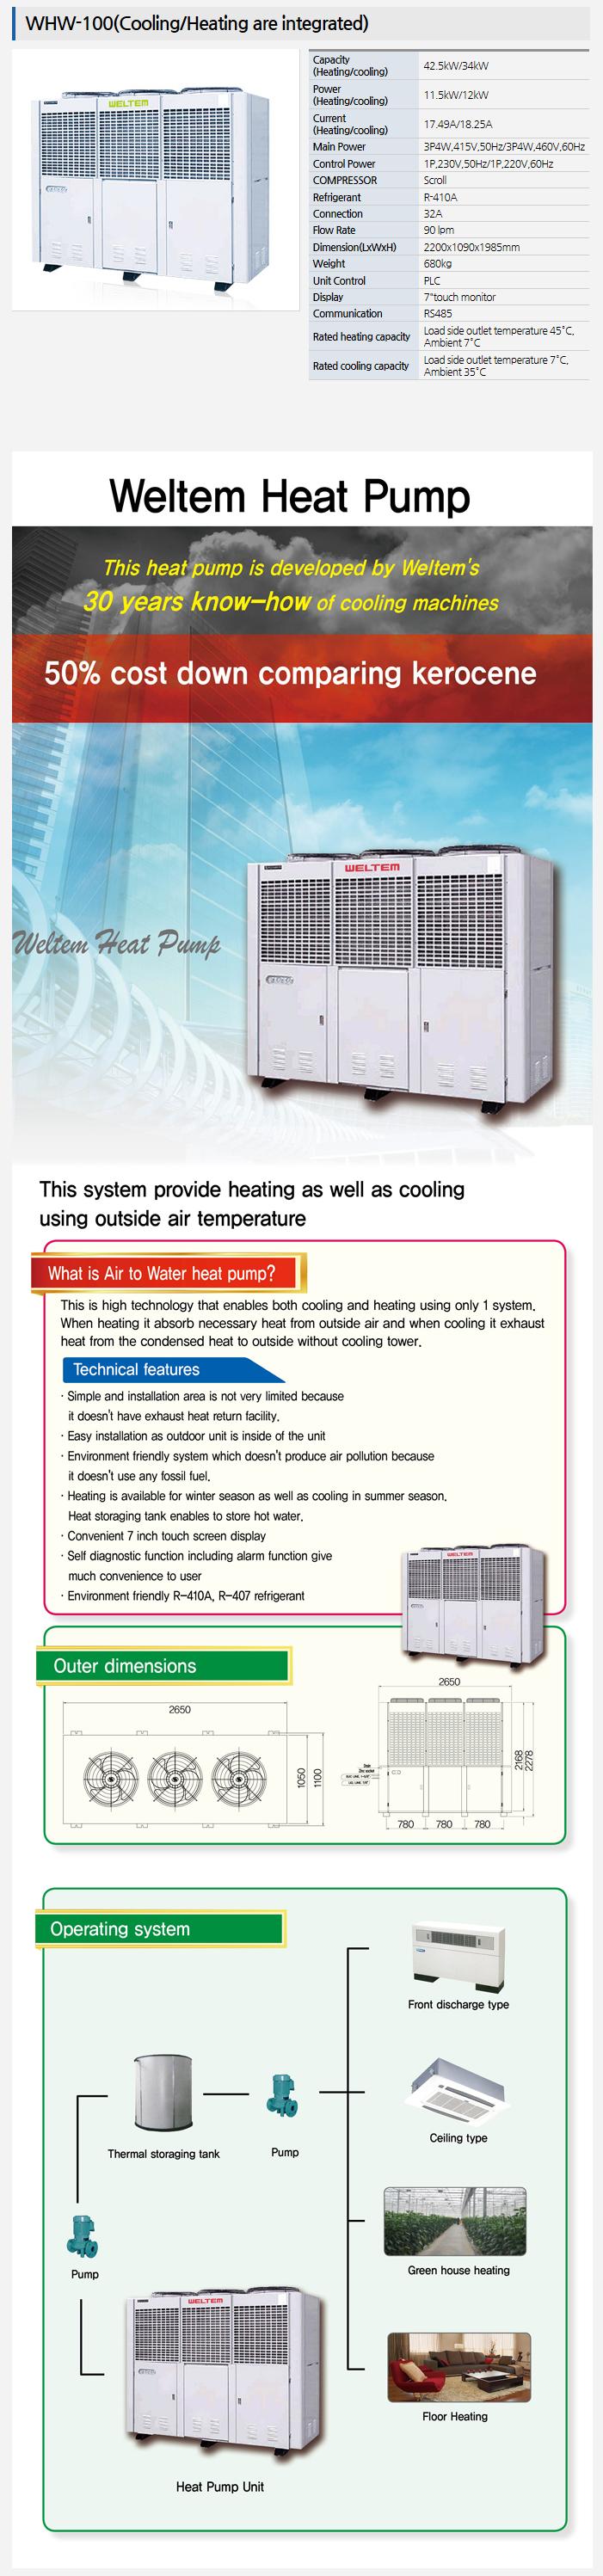 WELTEM Heatpump WHW-100